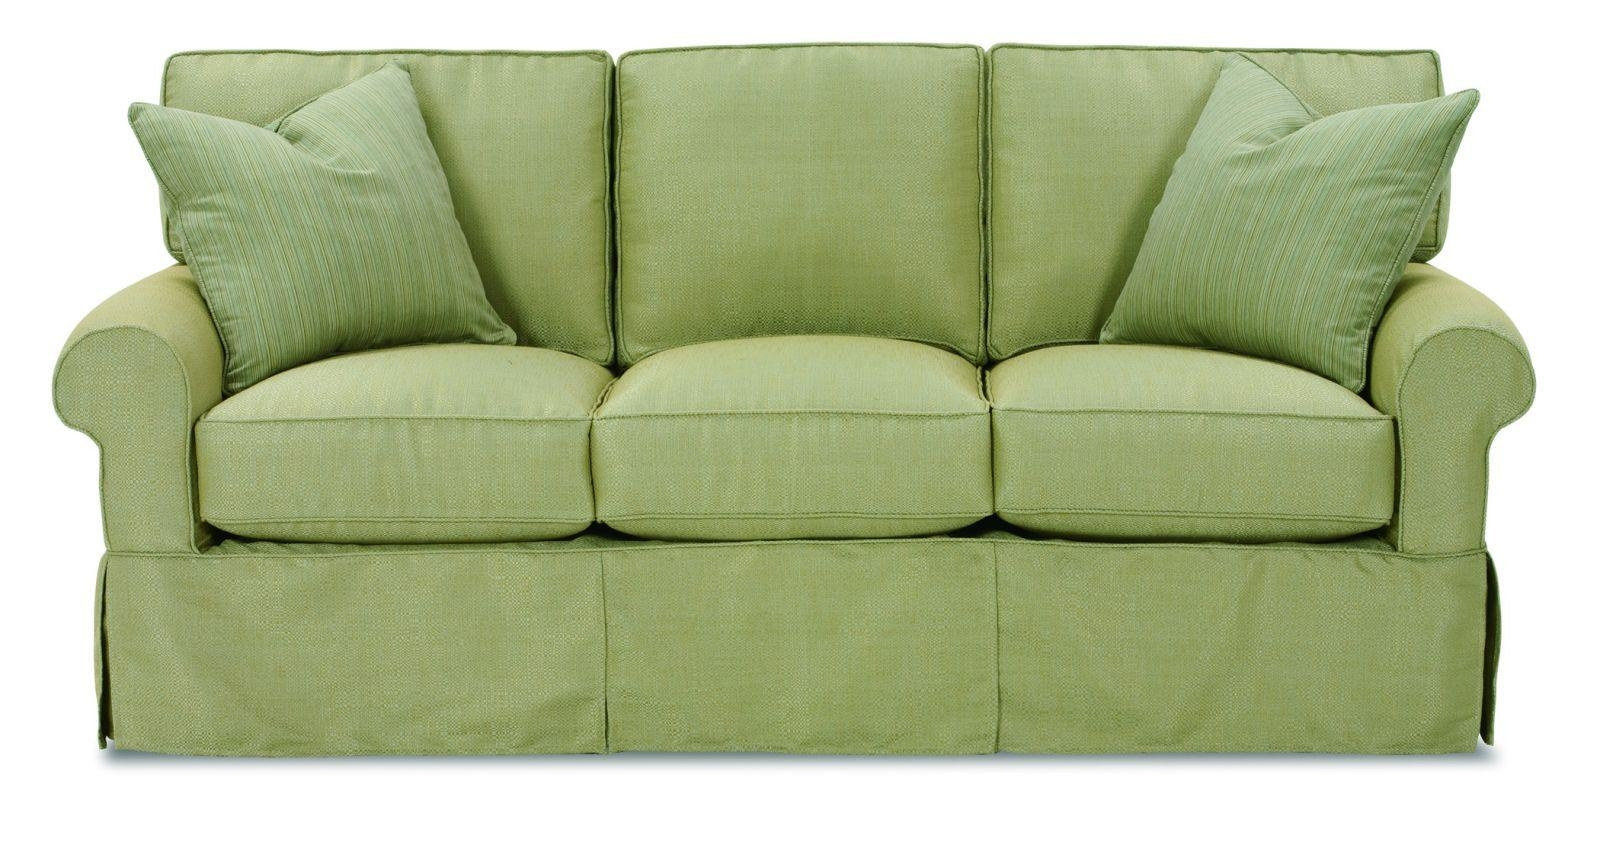 Furniture: T Cushion Sofa Slipcovers | Sofa Slipcover | Slipcovers With Slipcovers Sofas (Image 10 of 20)